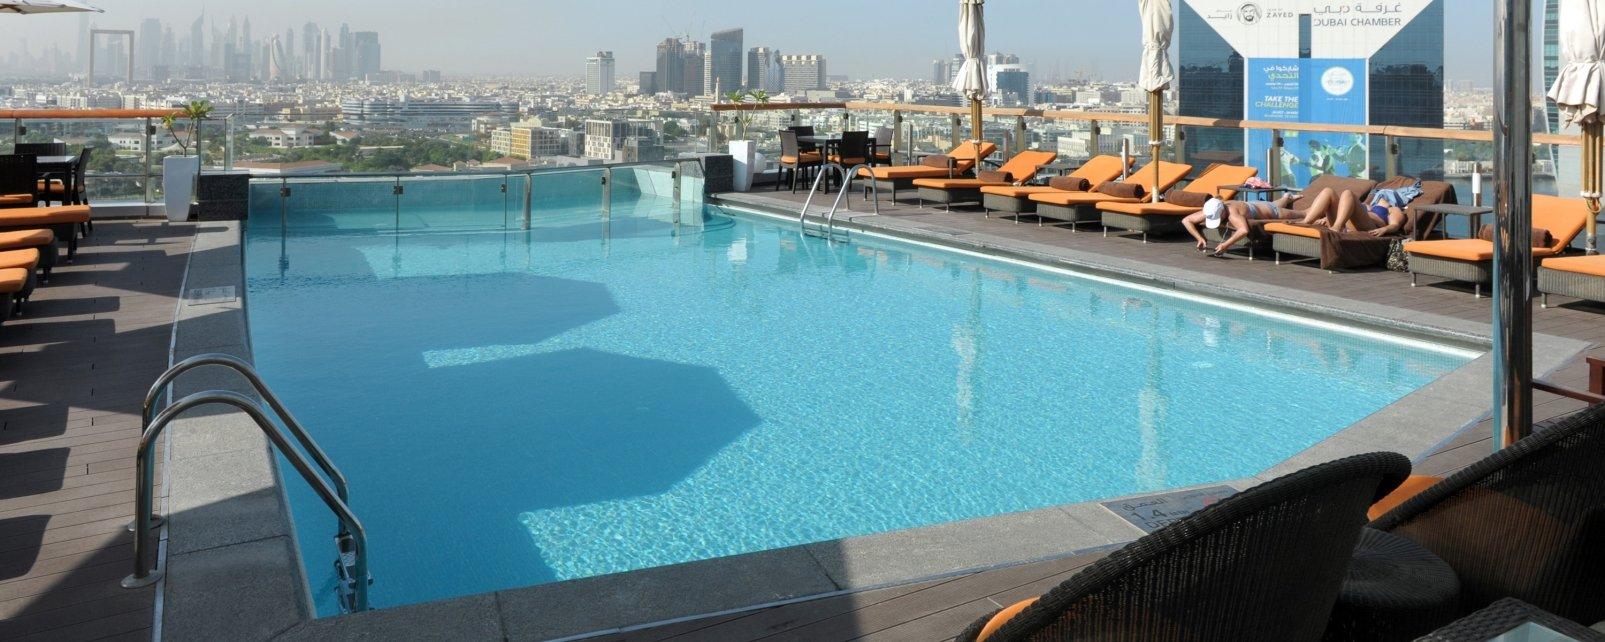 Hotel Hilton Dubai Creek